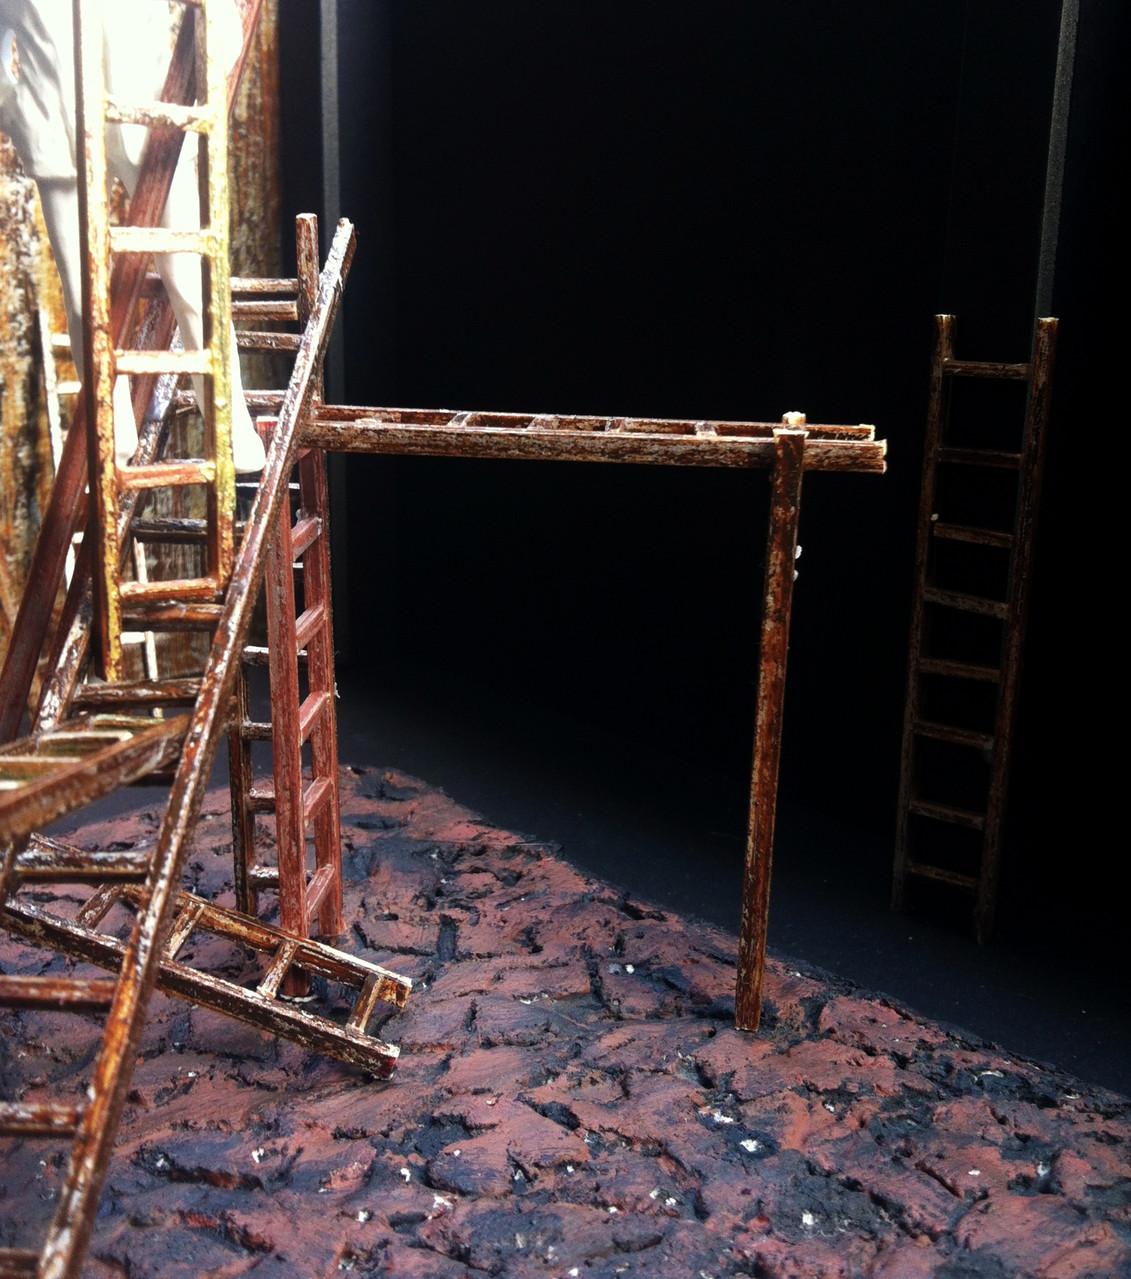 Modell - Jonas Jagow - Maxim Gorki Theater Berlin